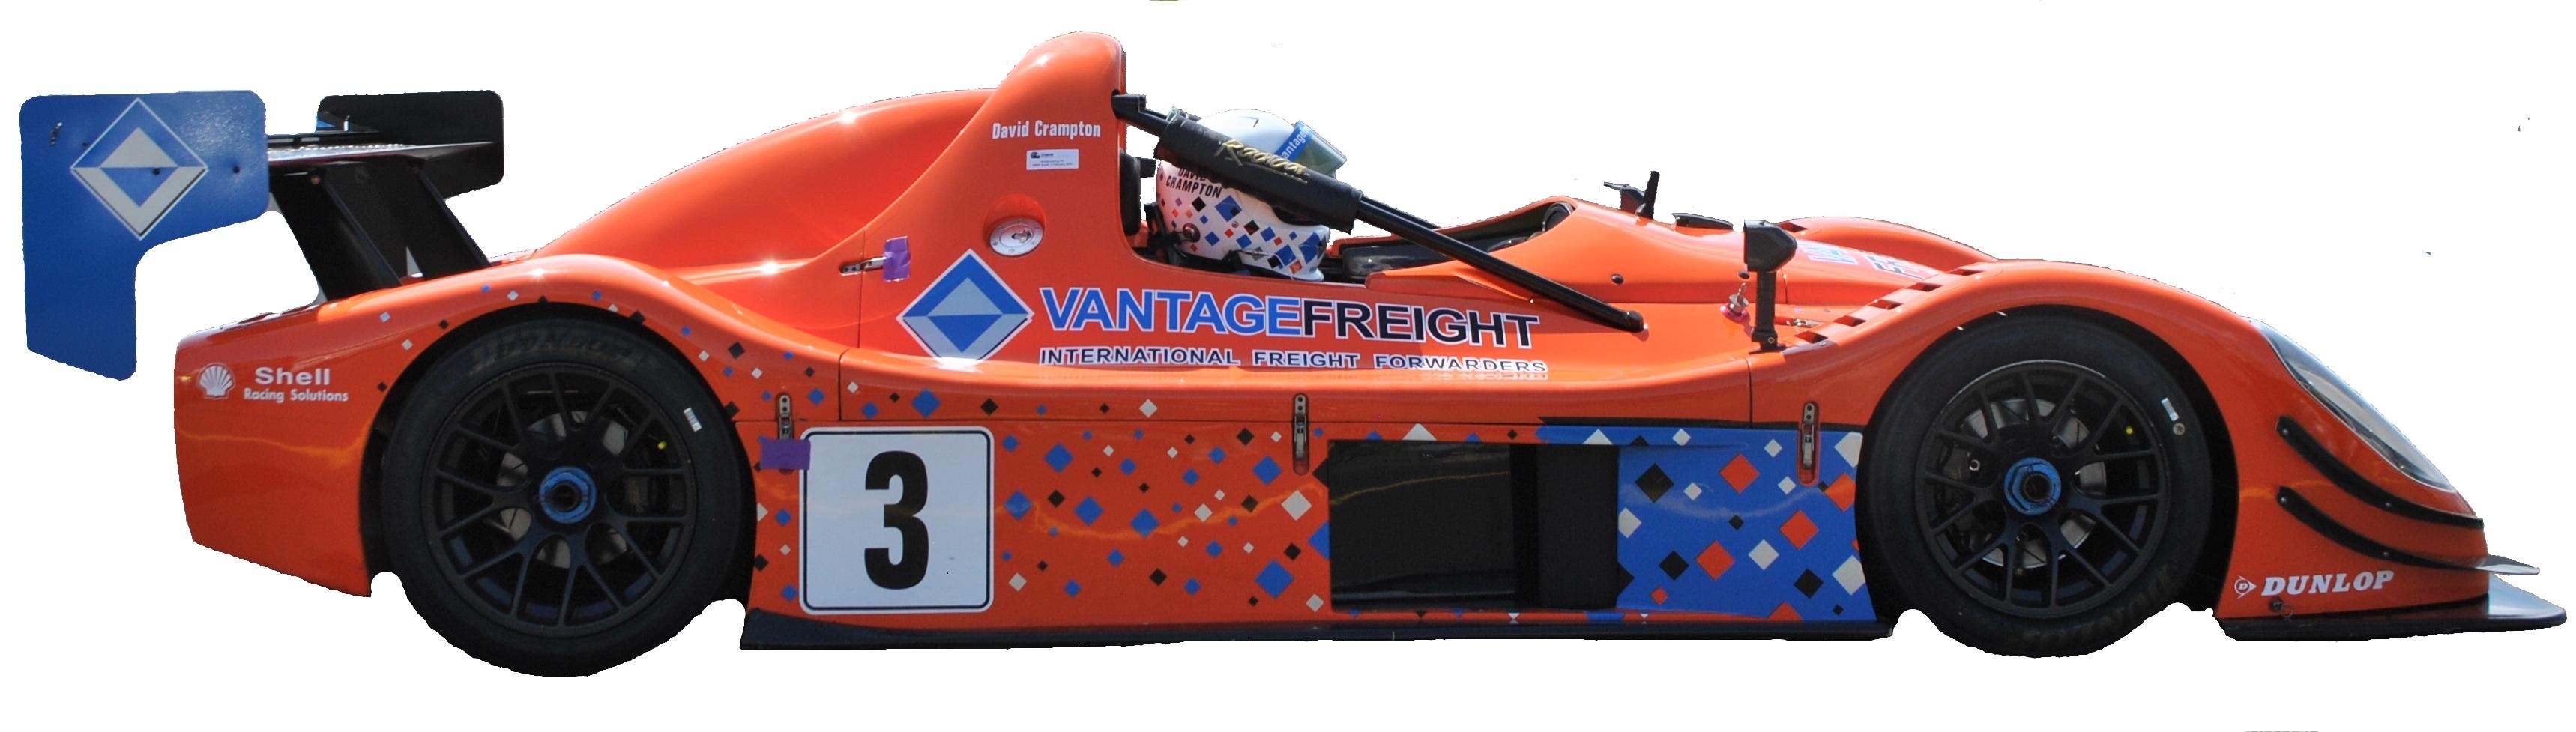 Vantage Racing Radical Car Vantage Freight